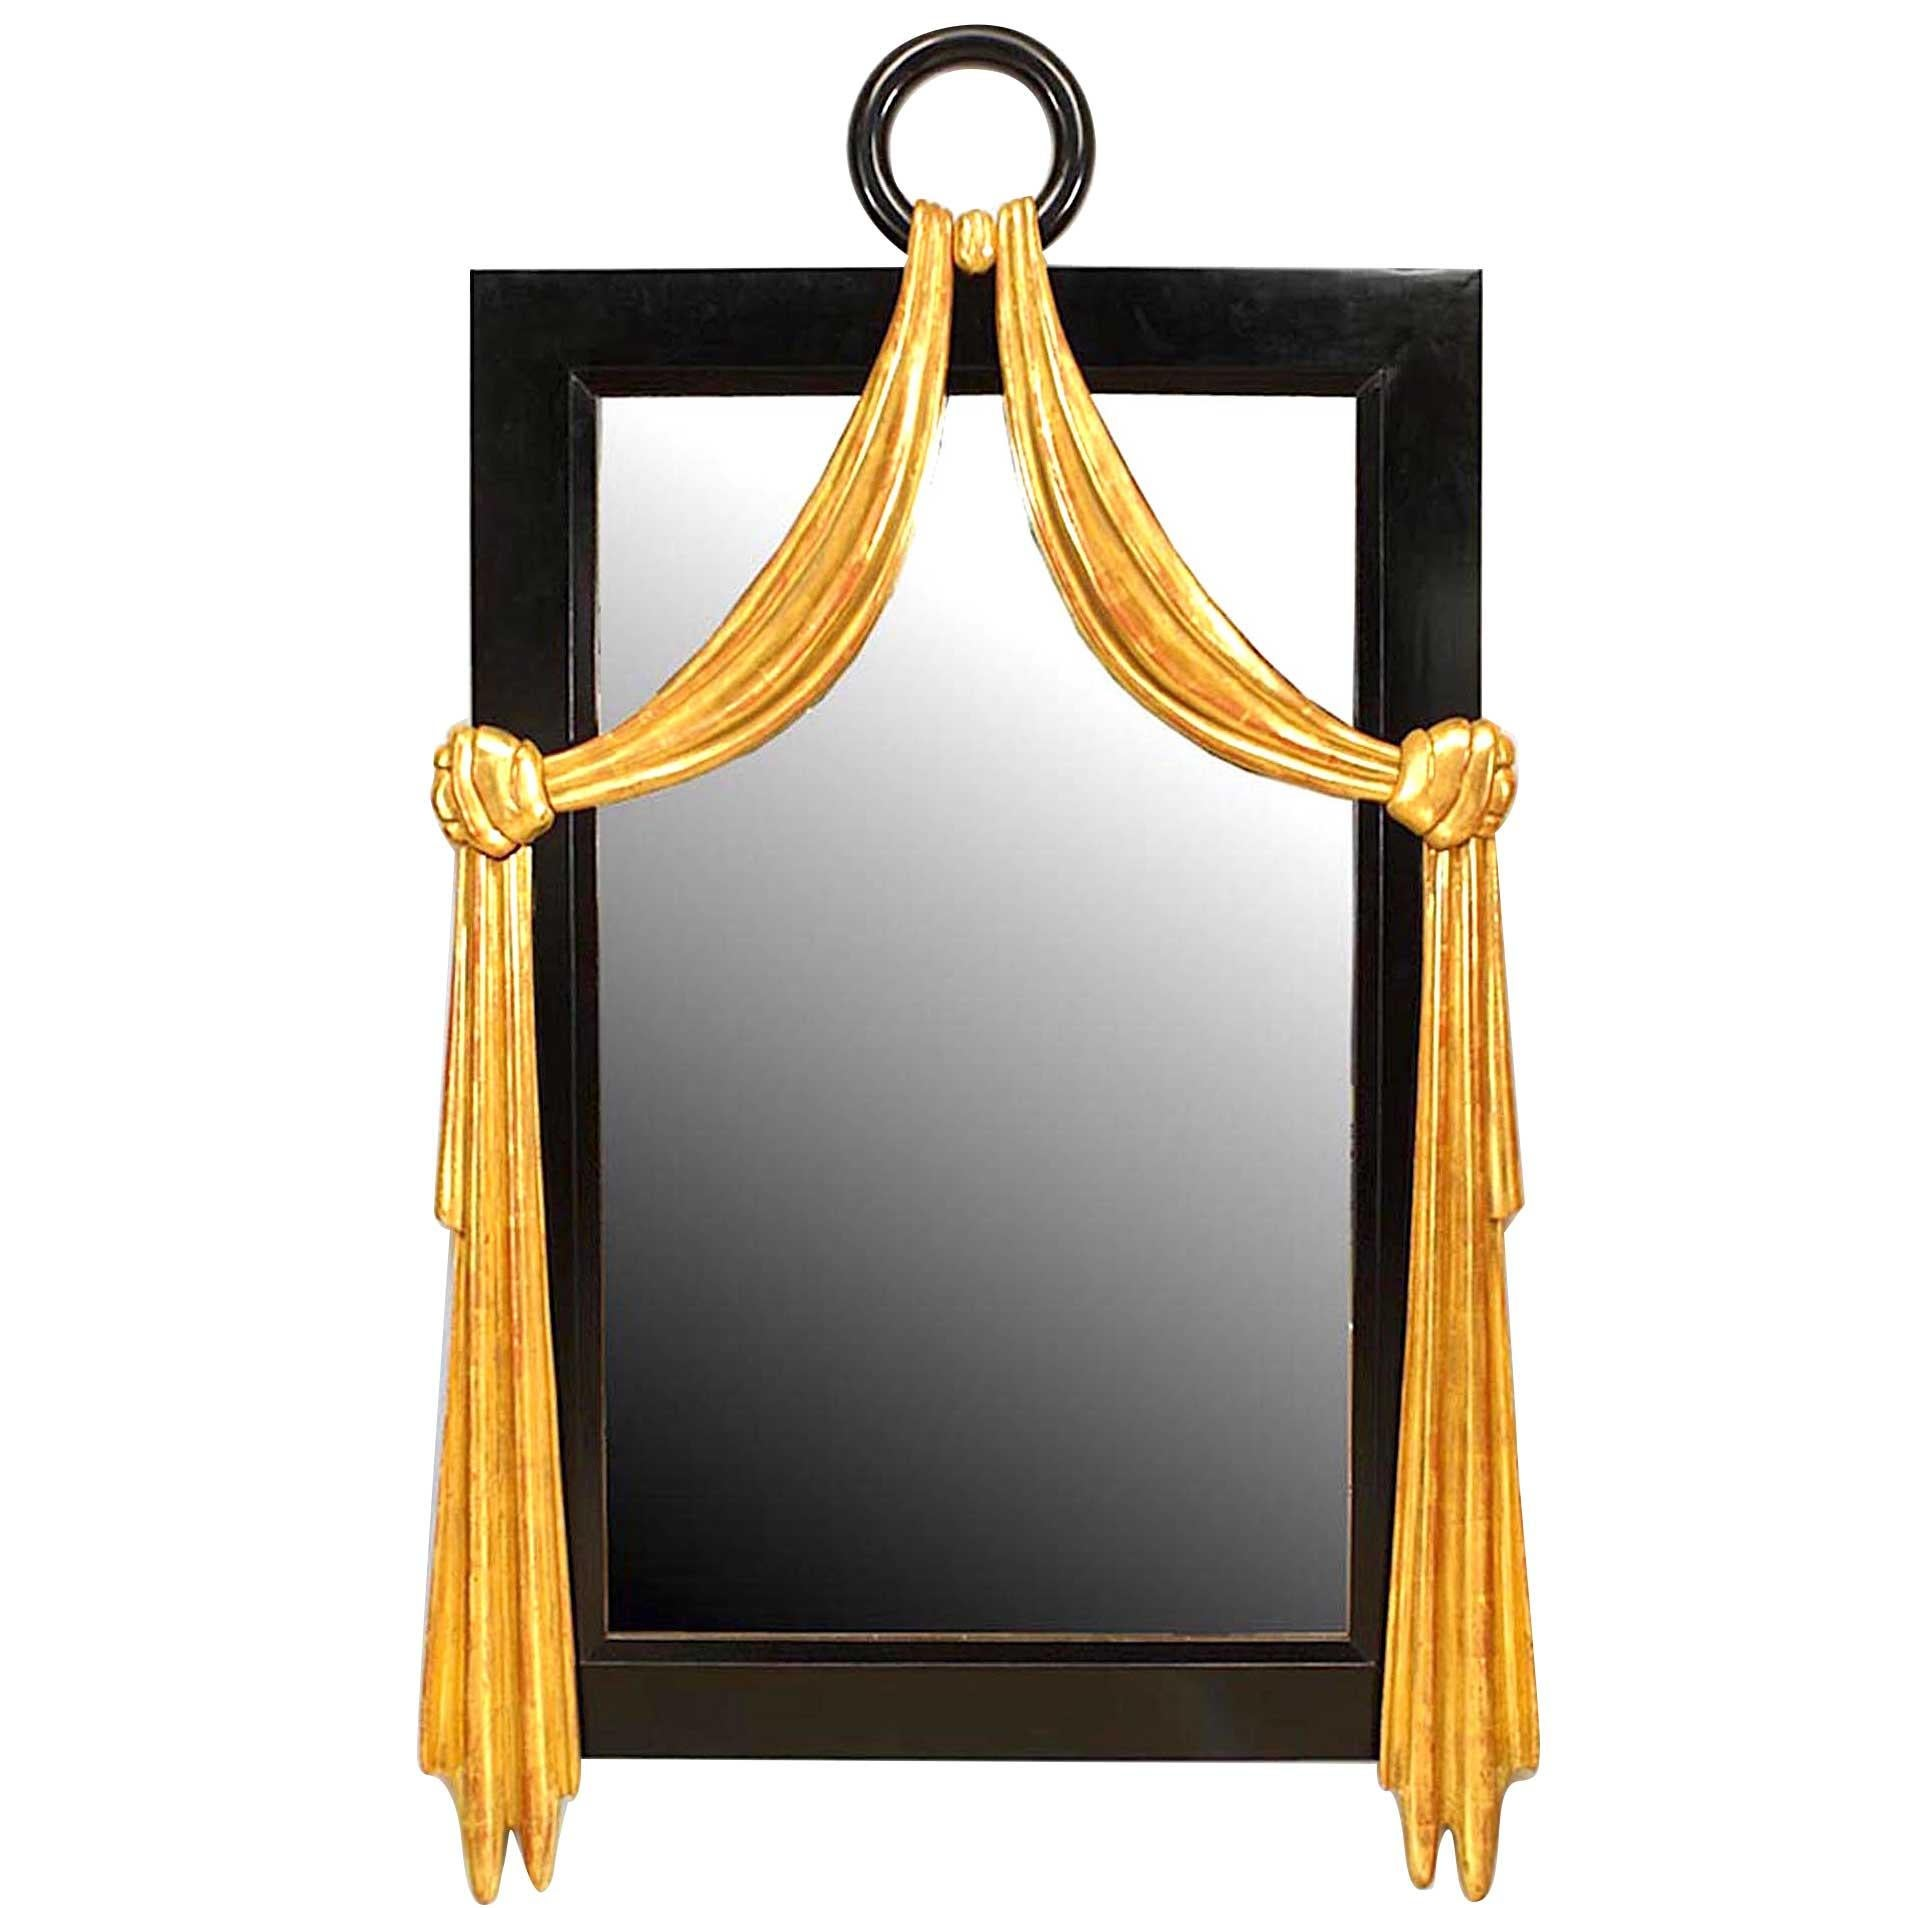 French Art Deco Style Ebonized Wall Mirror with Gilt Swag